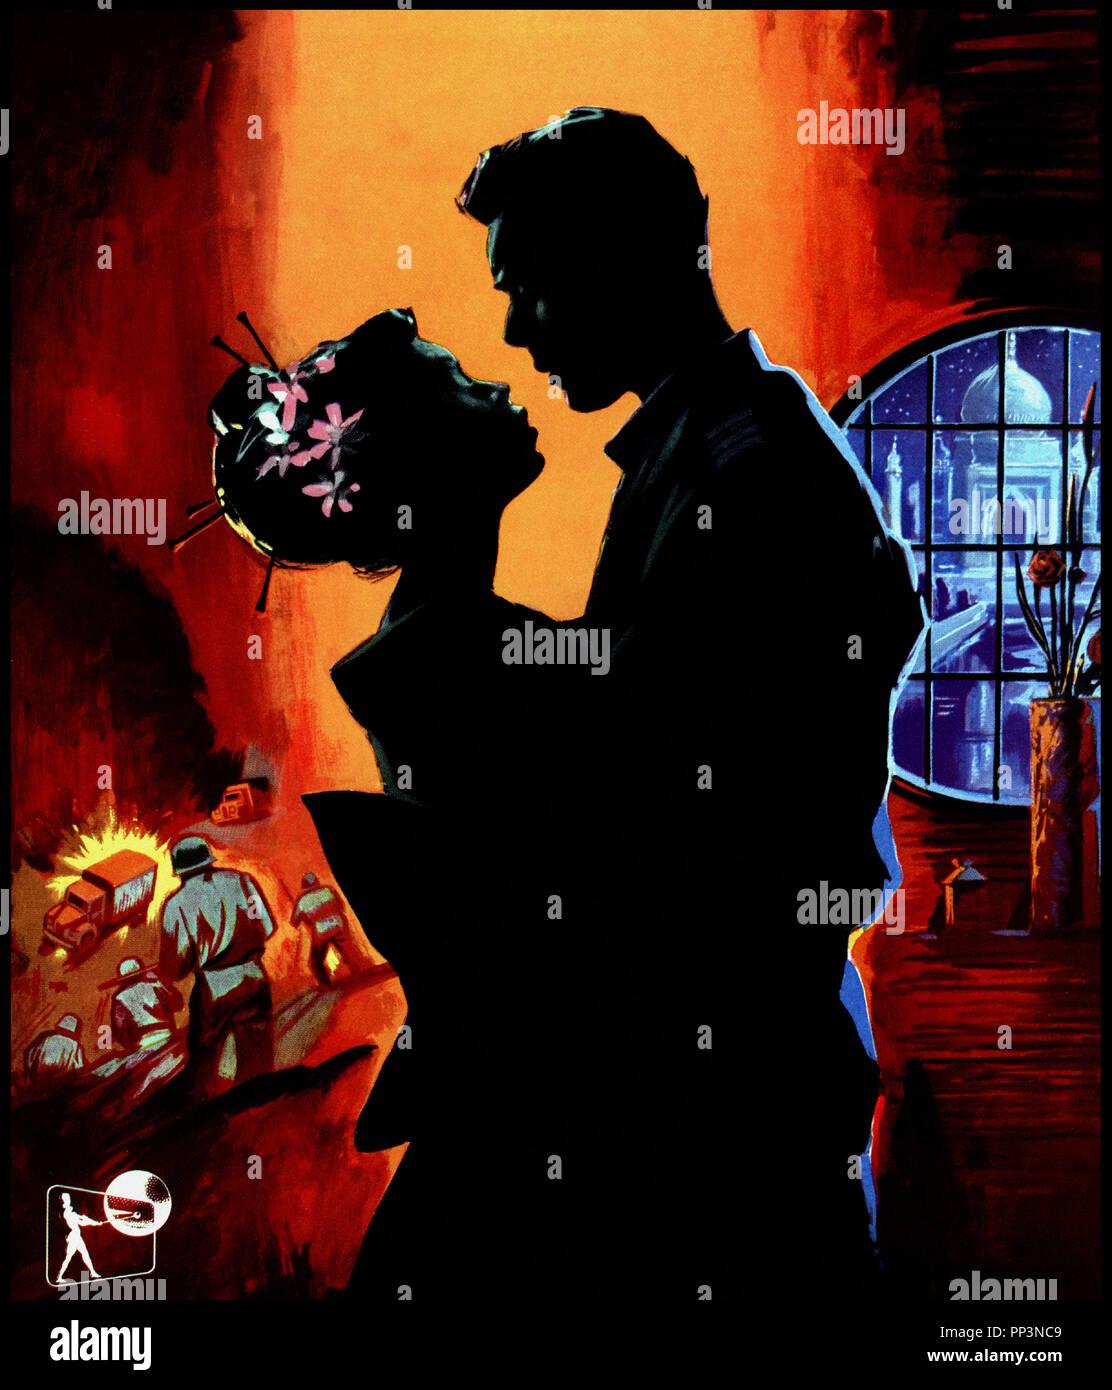 dating visuel roman pc gratis dating india delhi